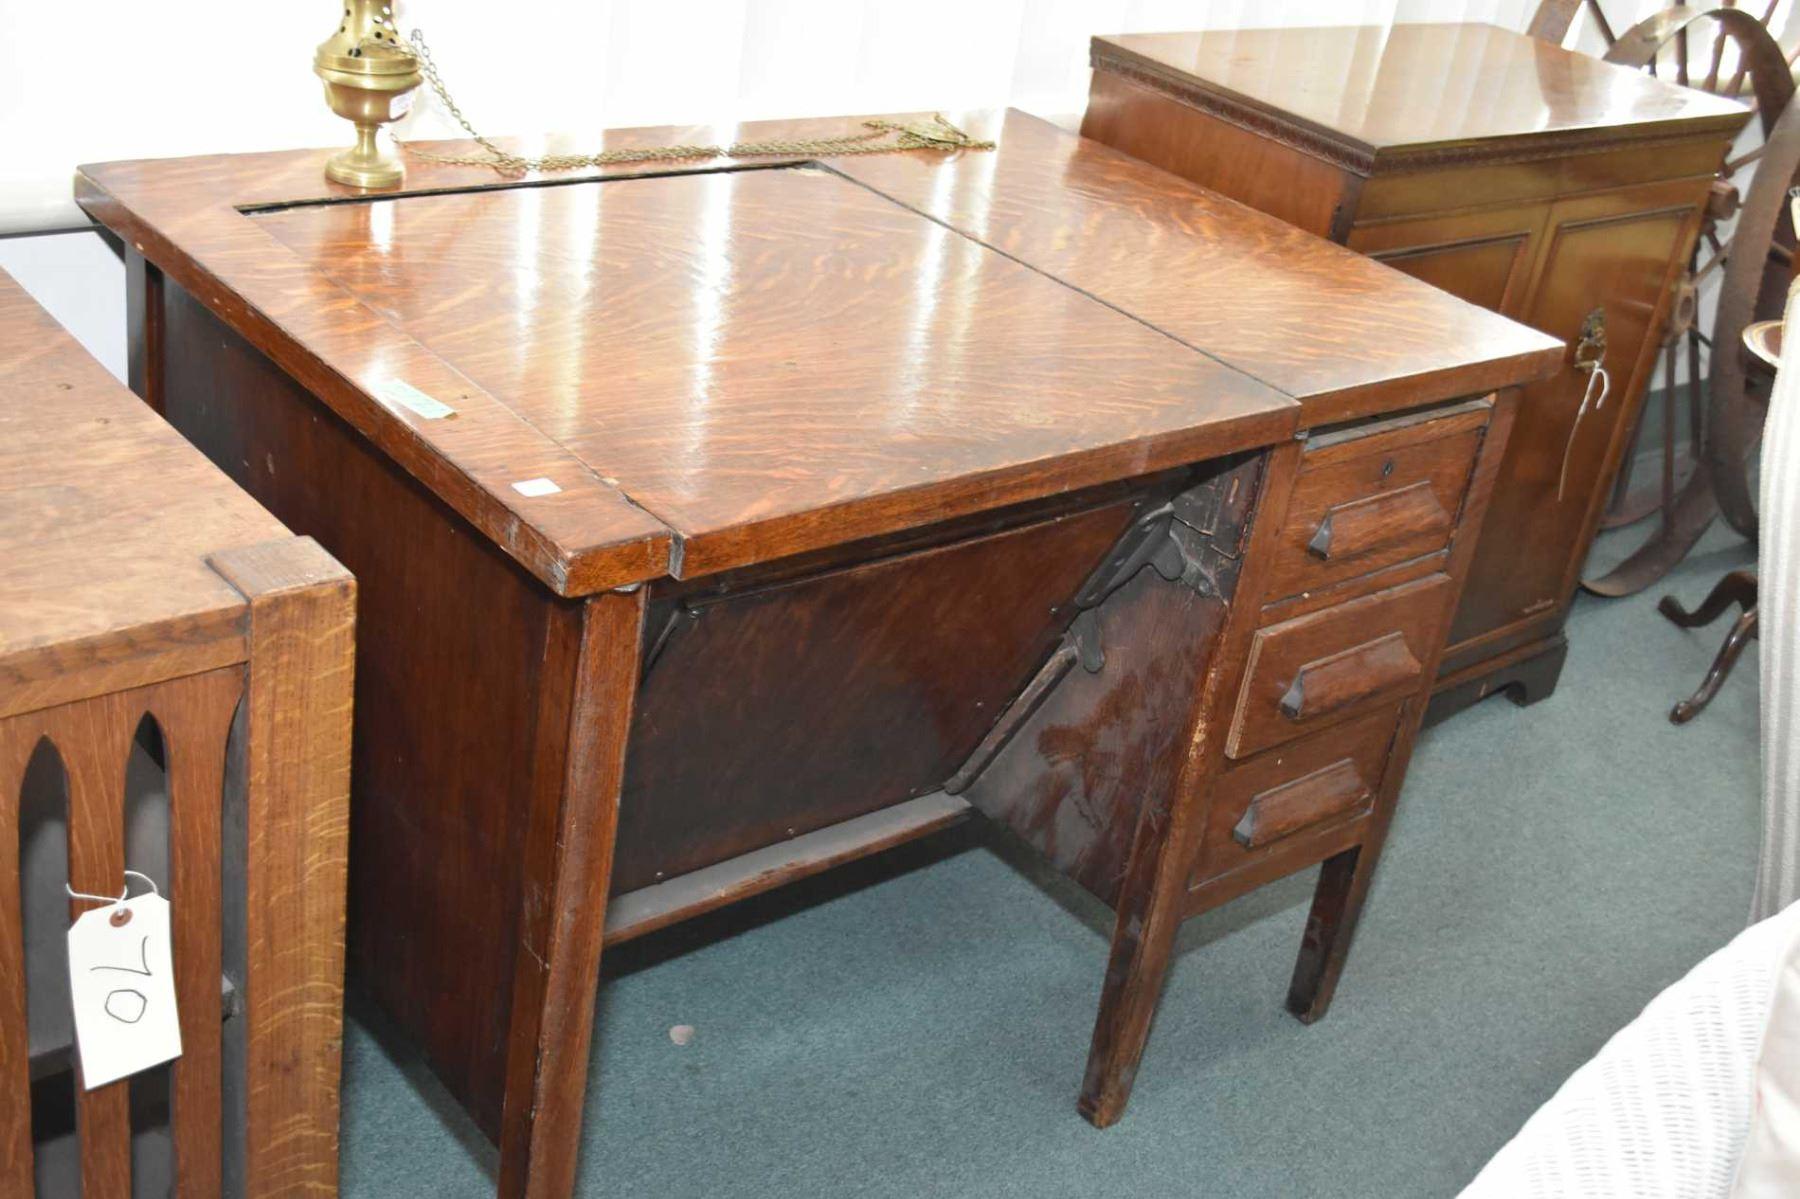 Antique Mission Style Single Drawer Quarter Cut Oak Desk With Book Storage On Each End